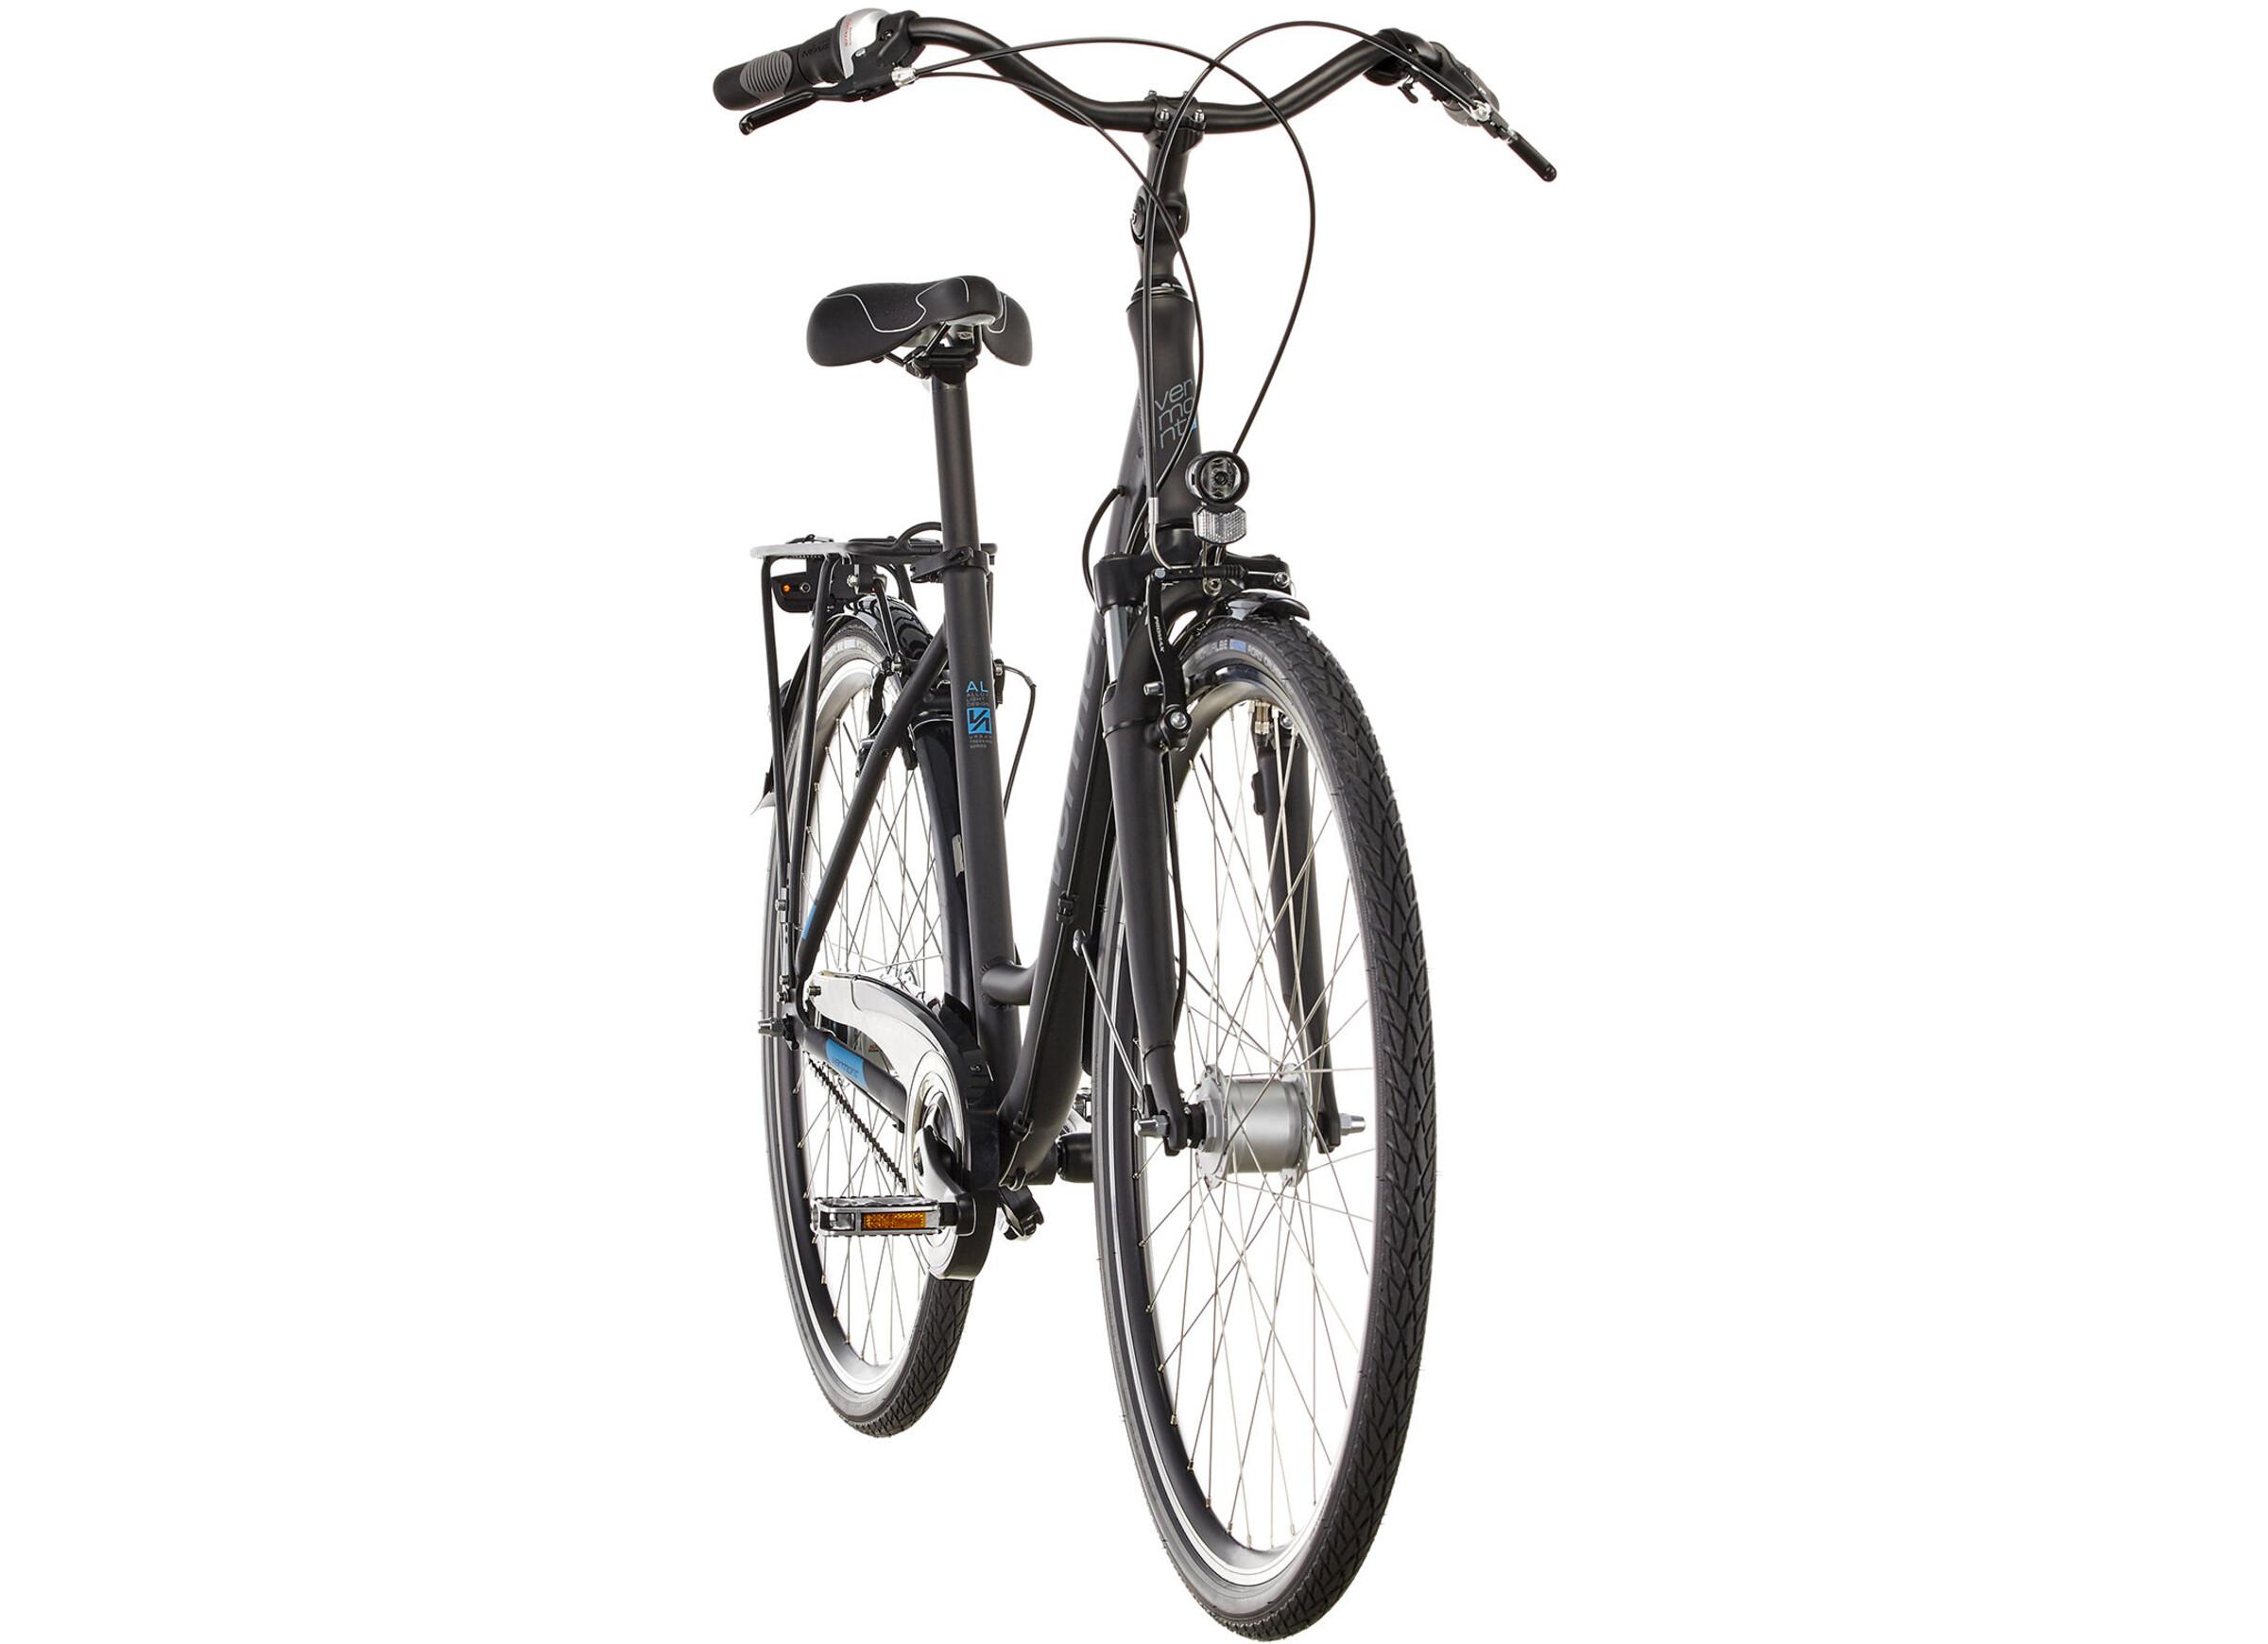 Vermont Jersey 8 - Bicicleta urbana - 28 negro   Bikester.es